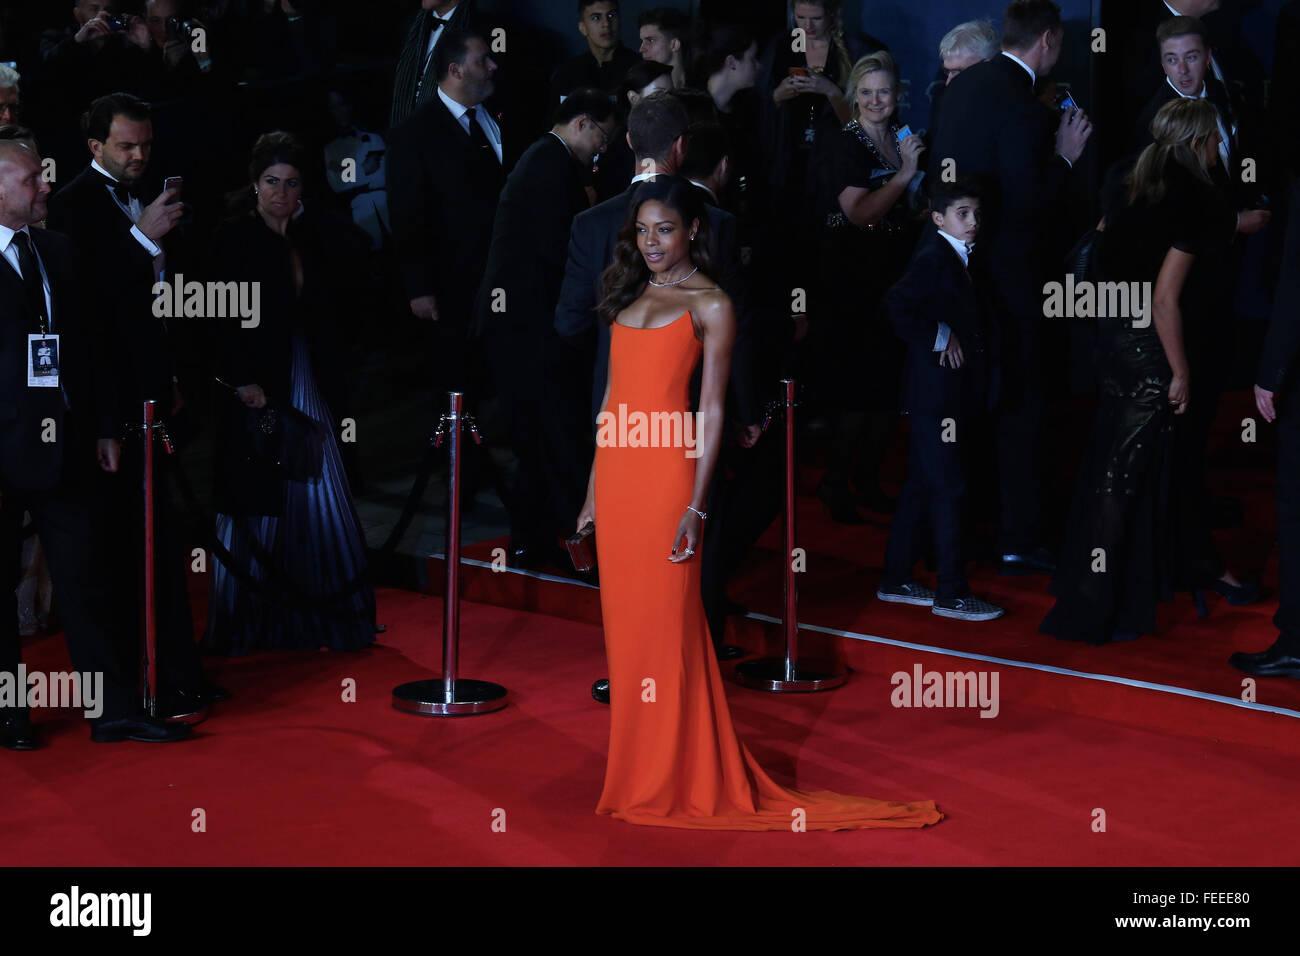 London, UK, 26th Oct 2015: Naomie Harris attends James Bond Spectre CTBF film premiere in London - Stock Image